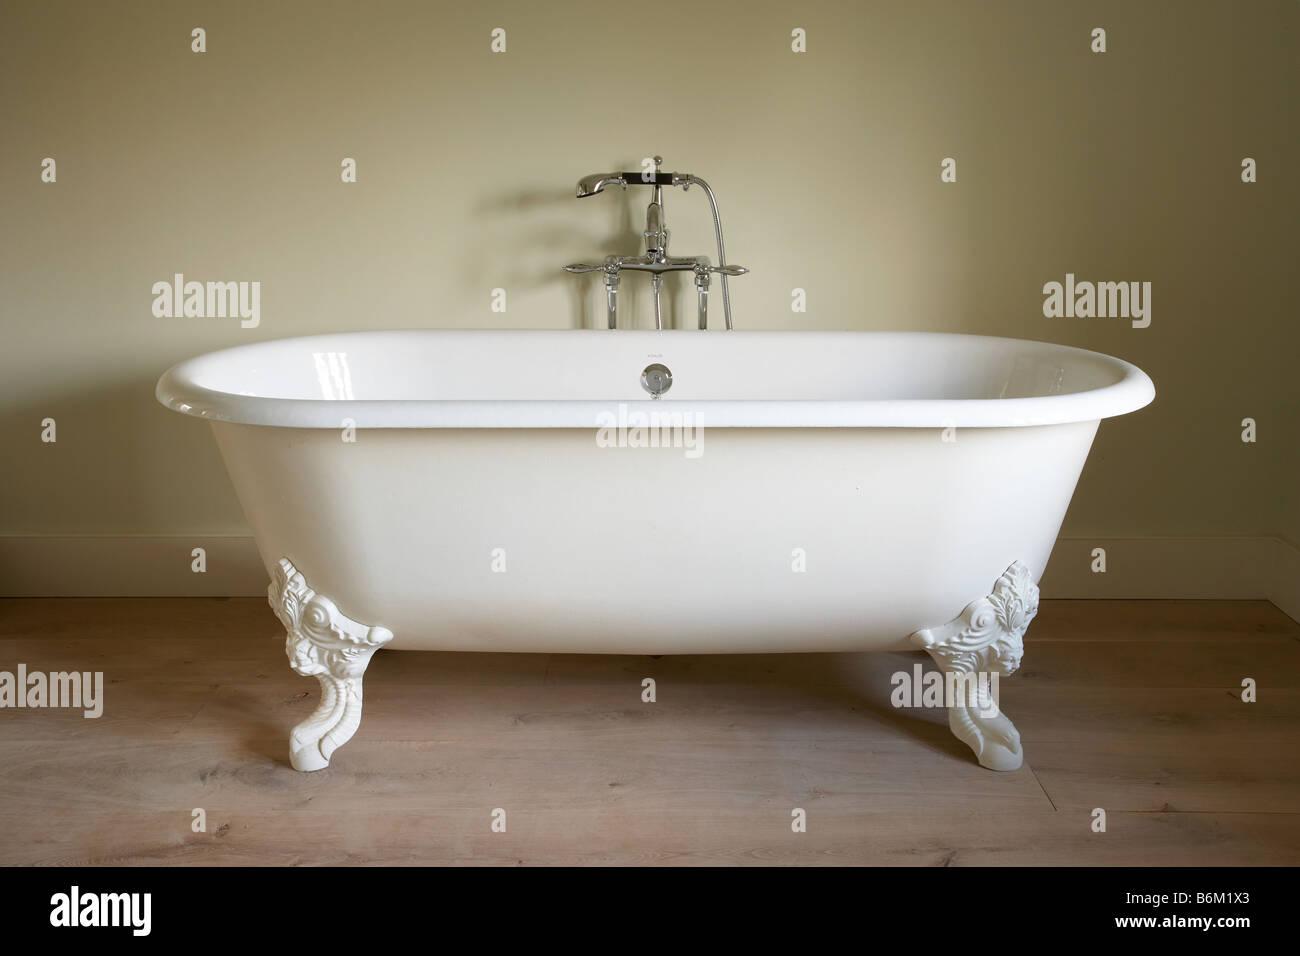 Free standing kohler victorian style bath bathtub chrome taps ornate ...